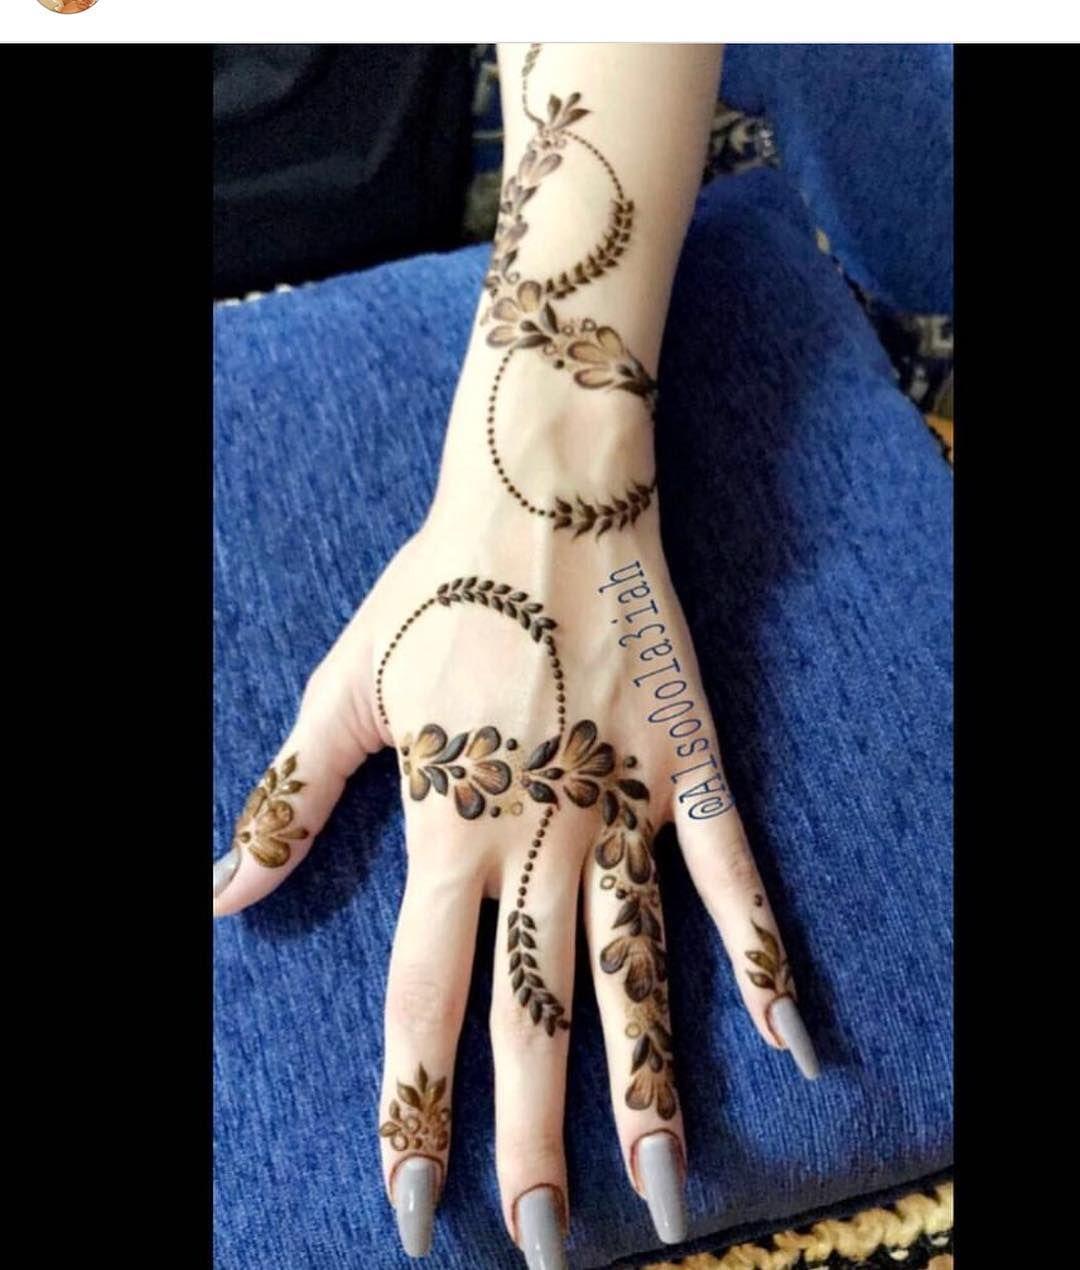 1 375 Likes 15 Comments حساب خاص لعرض صور الحناء 7ana Design On Instagram لاتنسئ ذكر الله ا Henna Designs Hand Mehndi Designs Floral Henna Designs